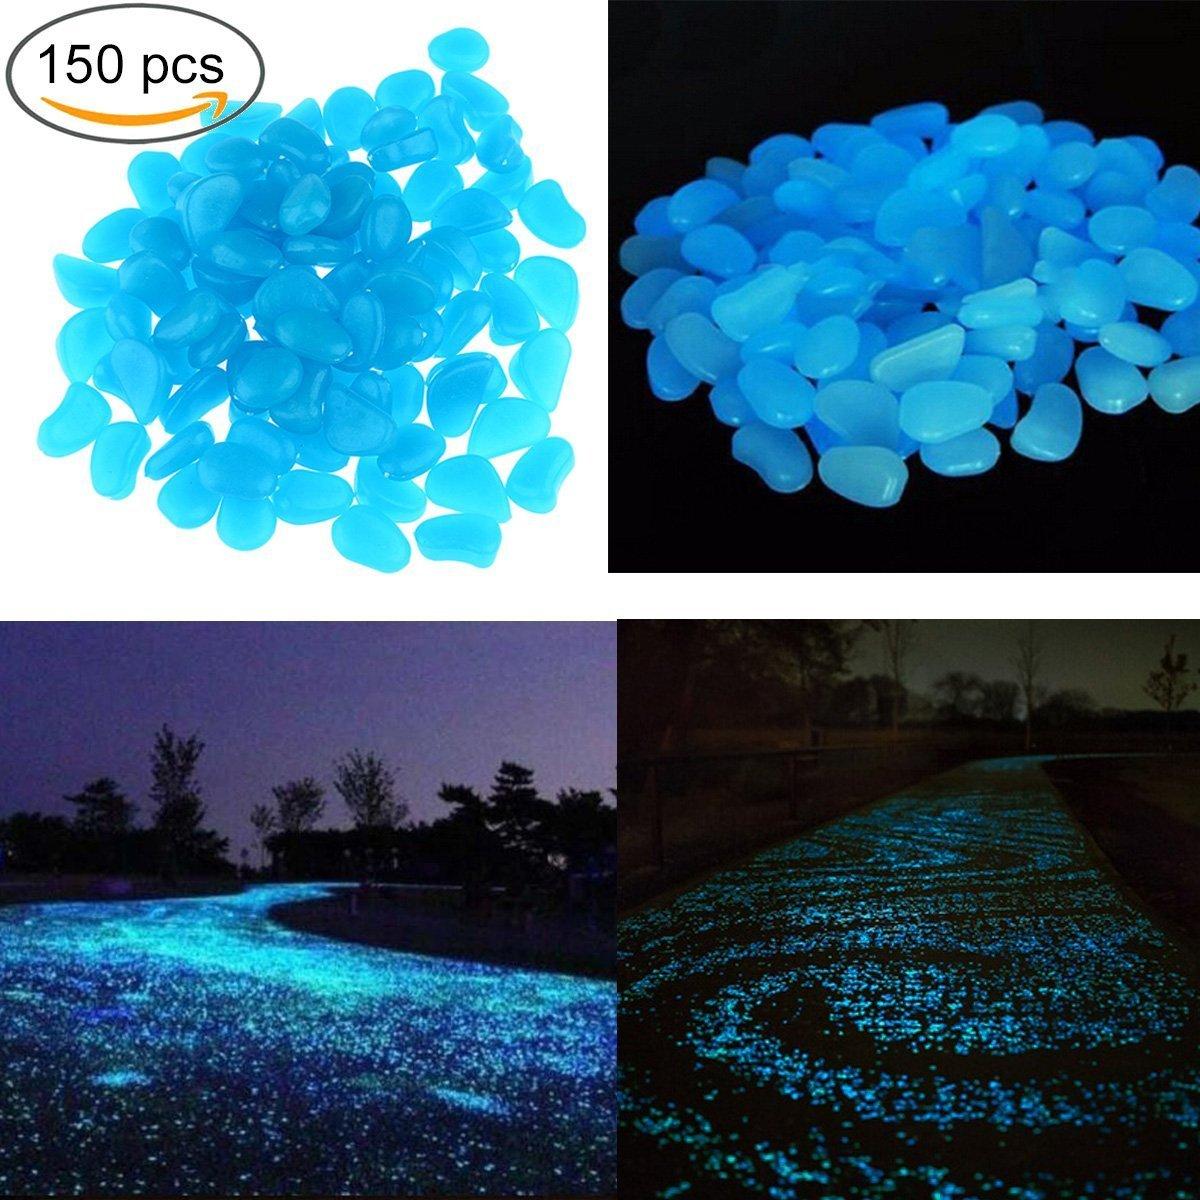 150pcs Glow in the Dark Garden Pebbles for Walkways & Decor and Plants Luminous Stones in Blue